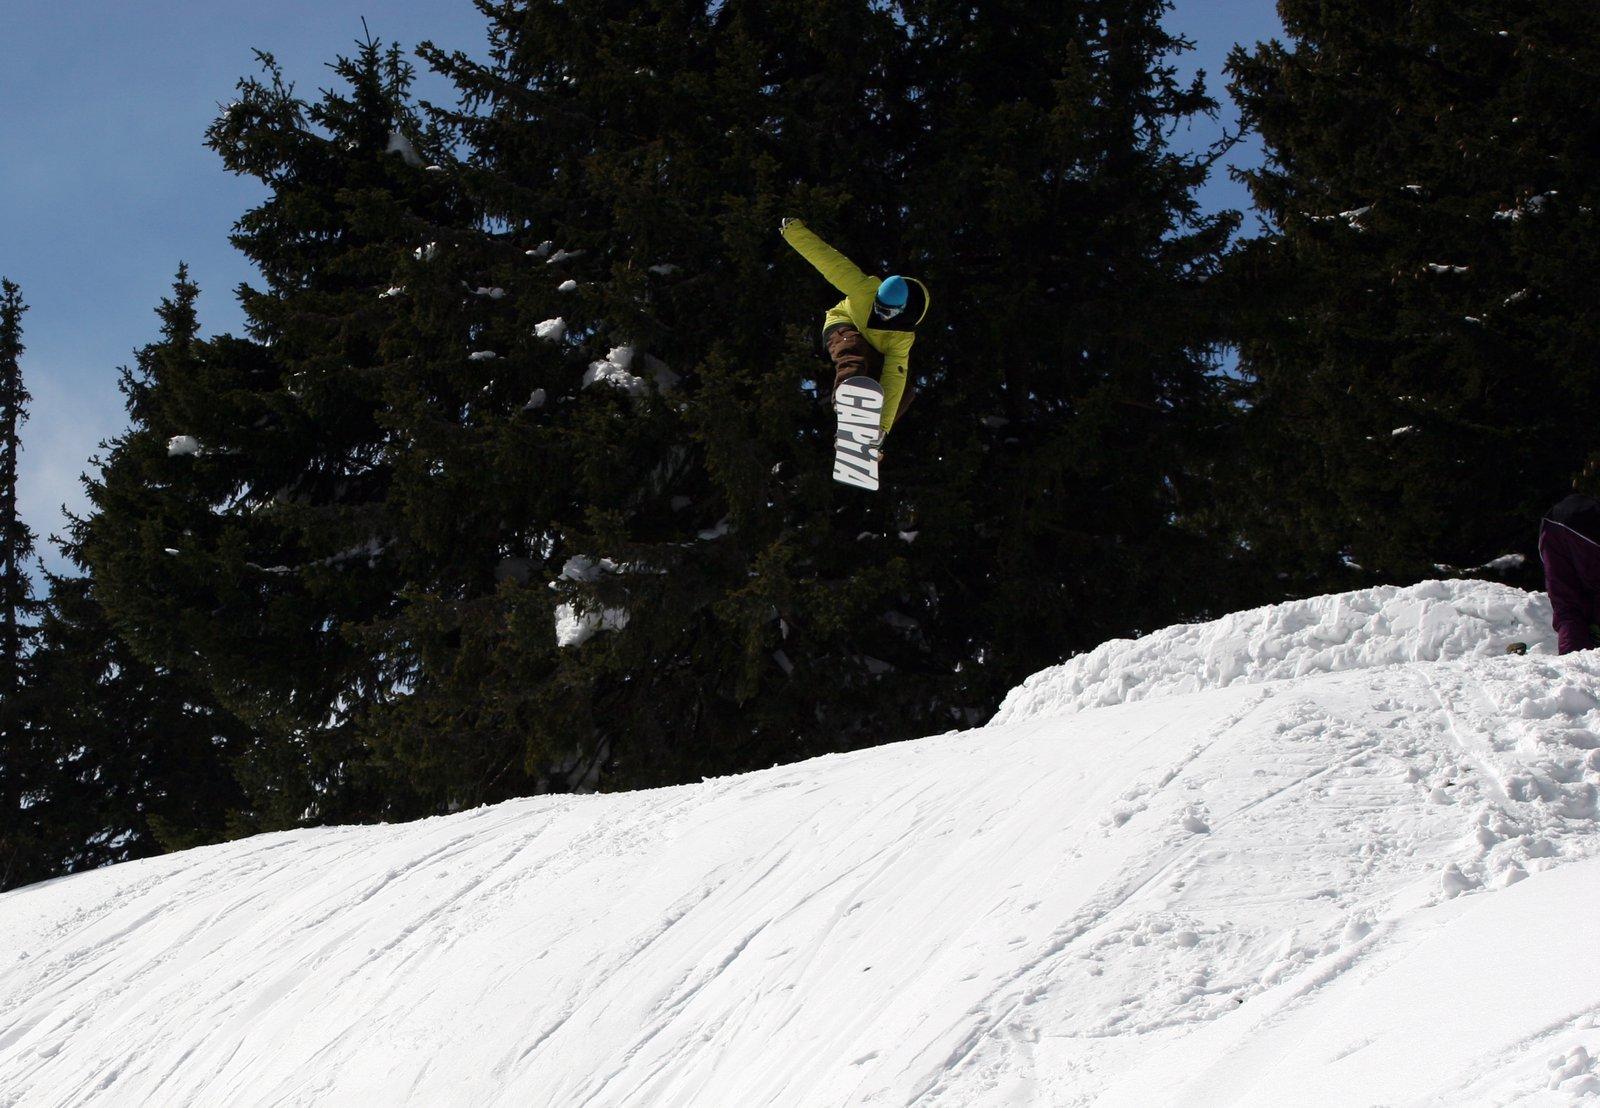 Snowboard mute